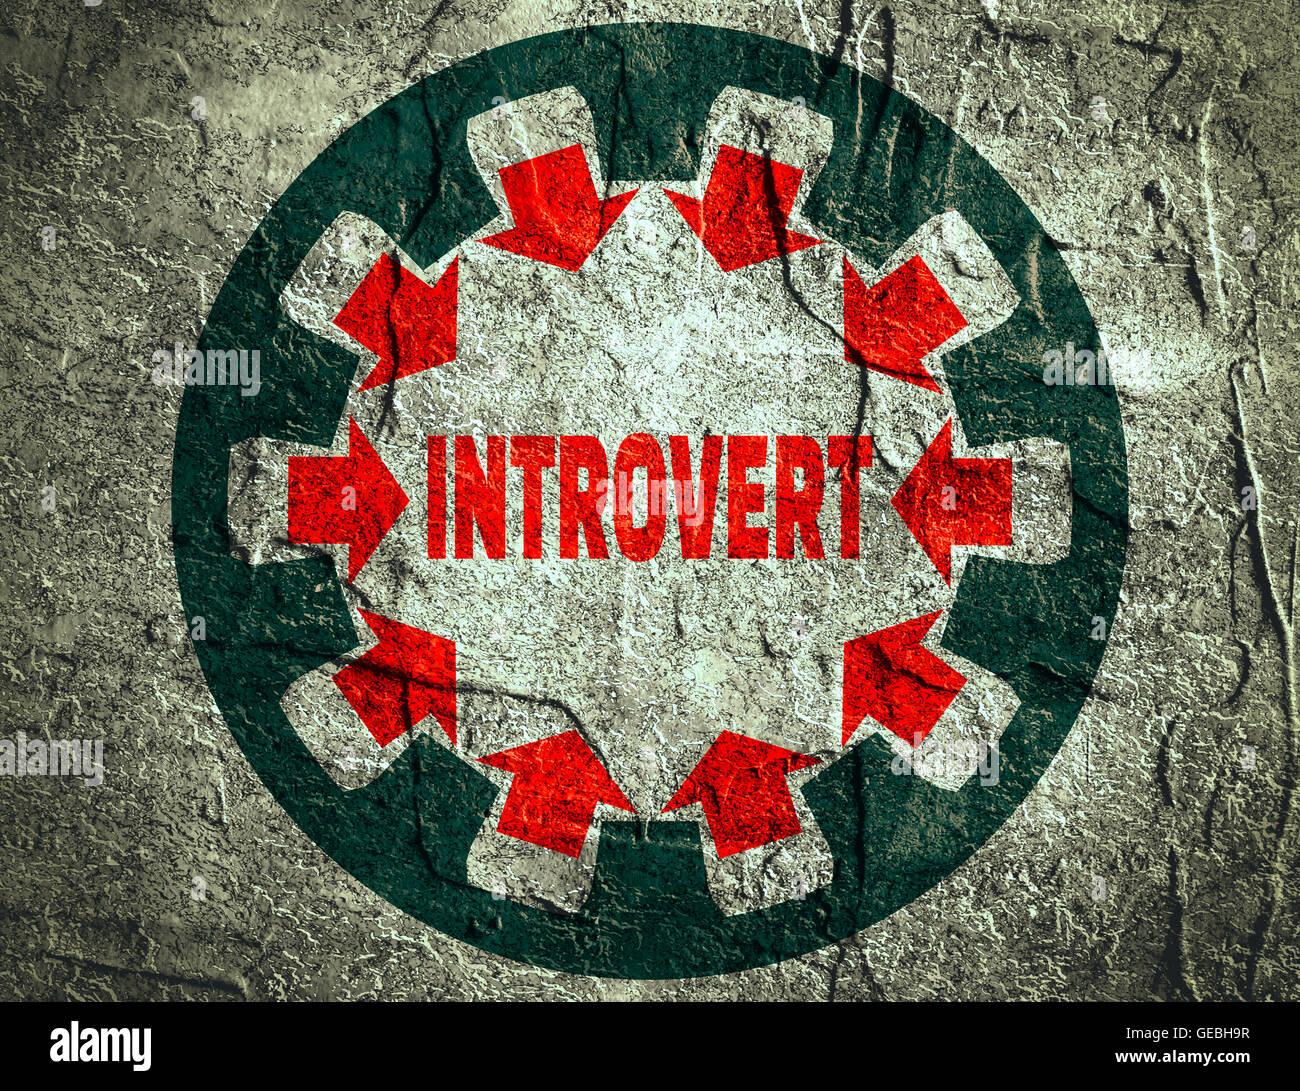 Introvert character. Psychlogy metaphor - Stock Image